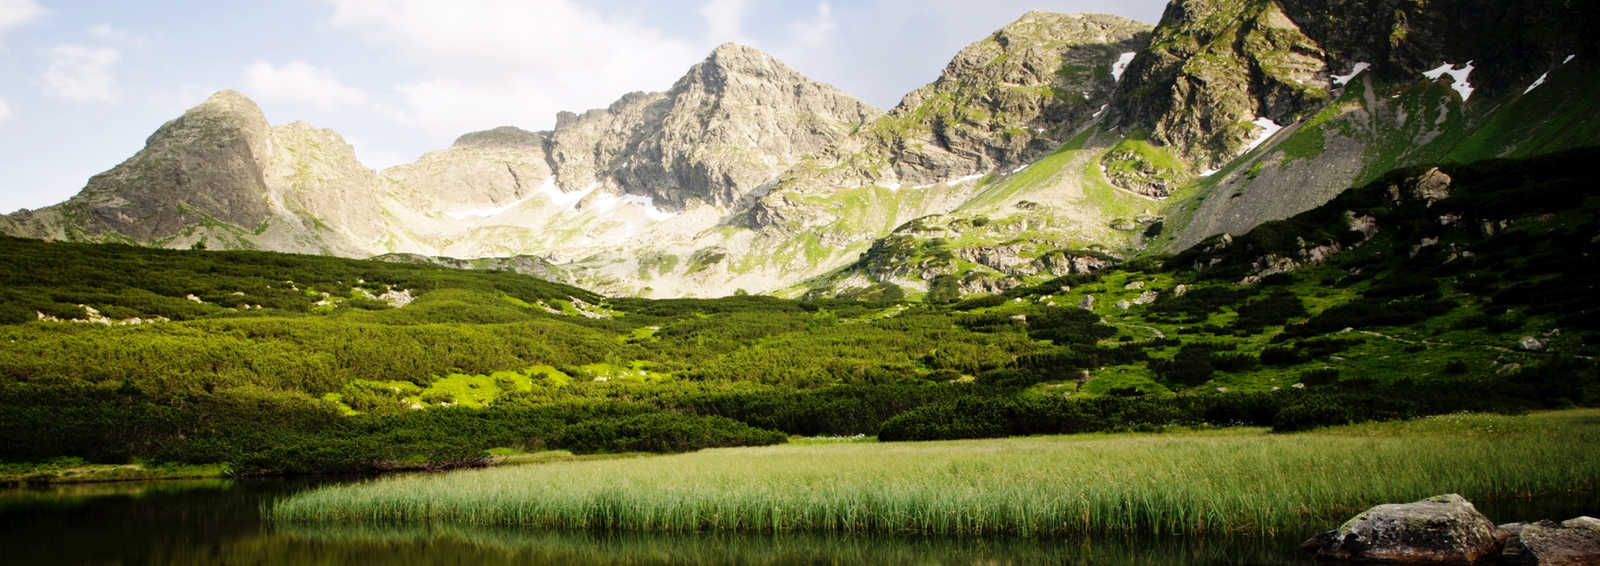 Polish Tatras, Poland